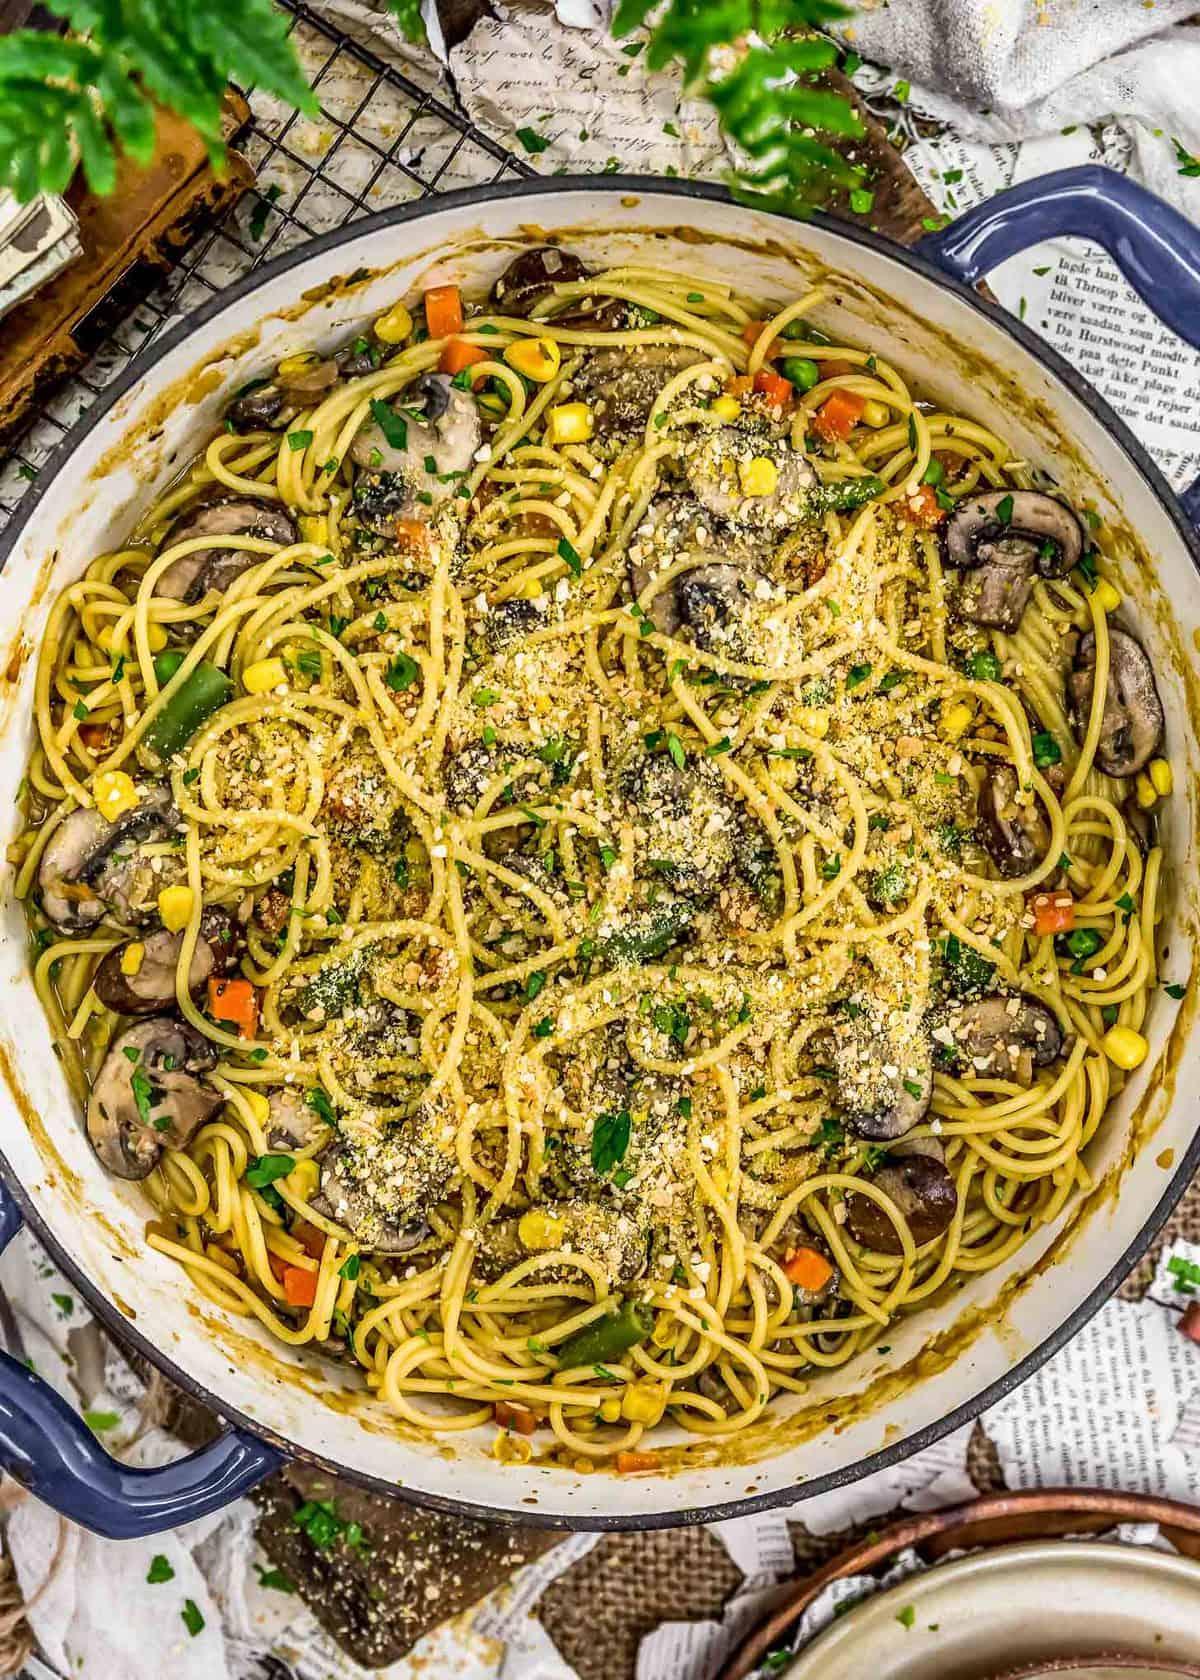 Skillet of Vegan Veggie Tetrazzini